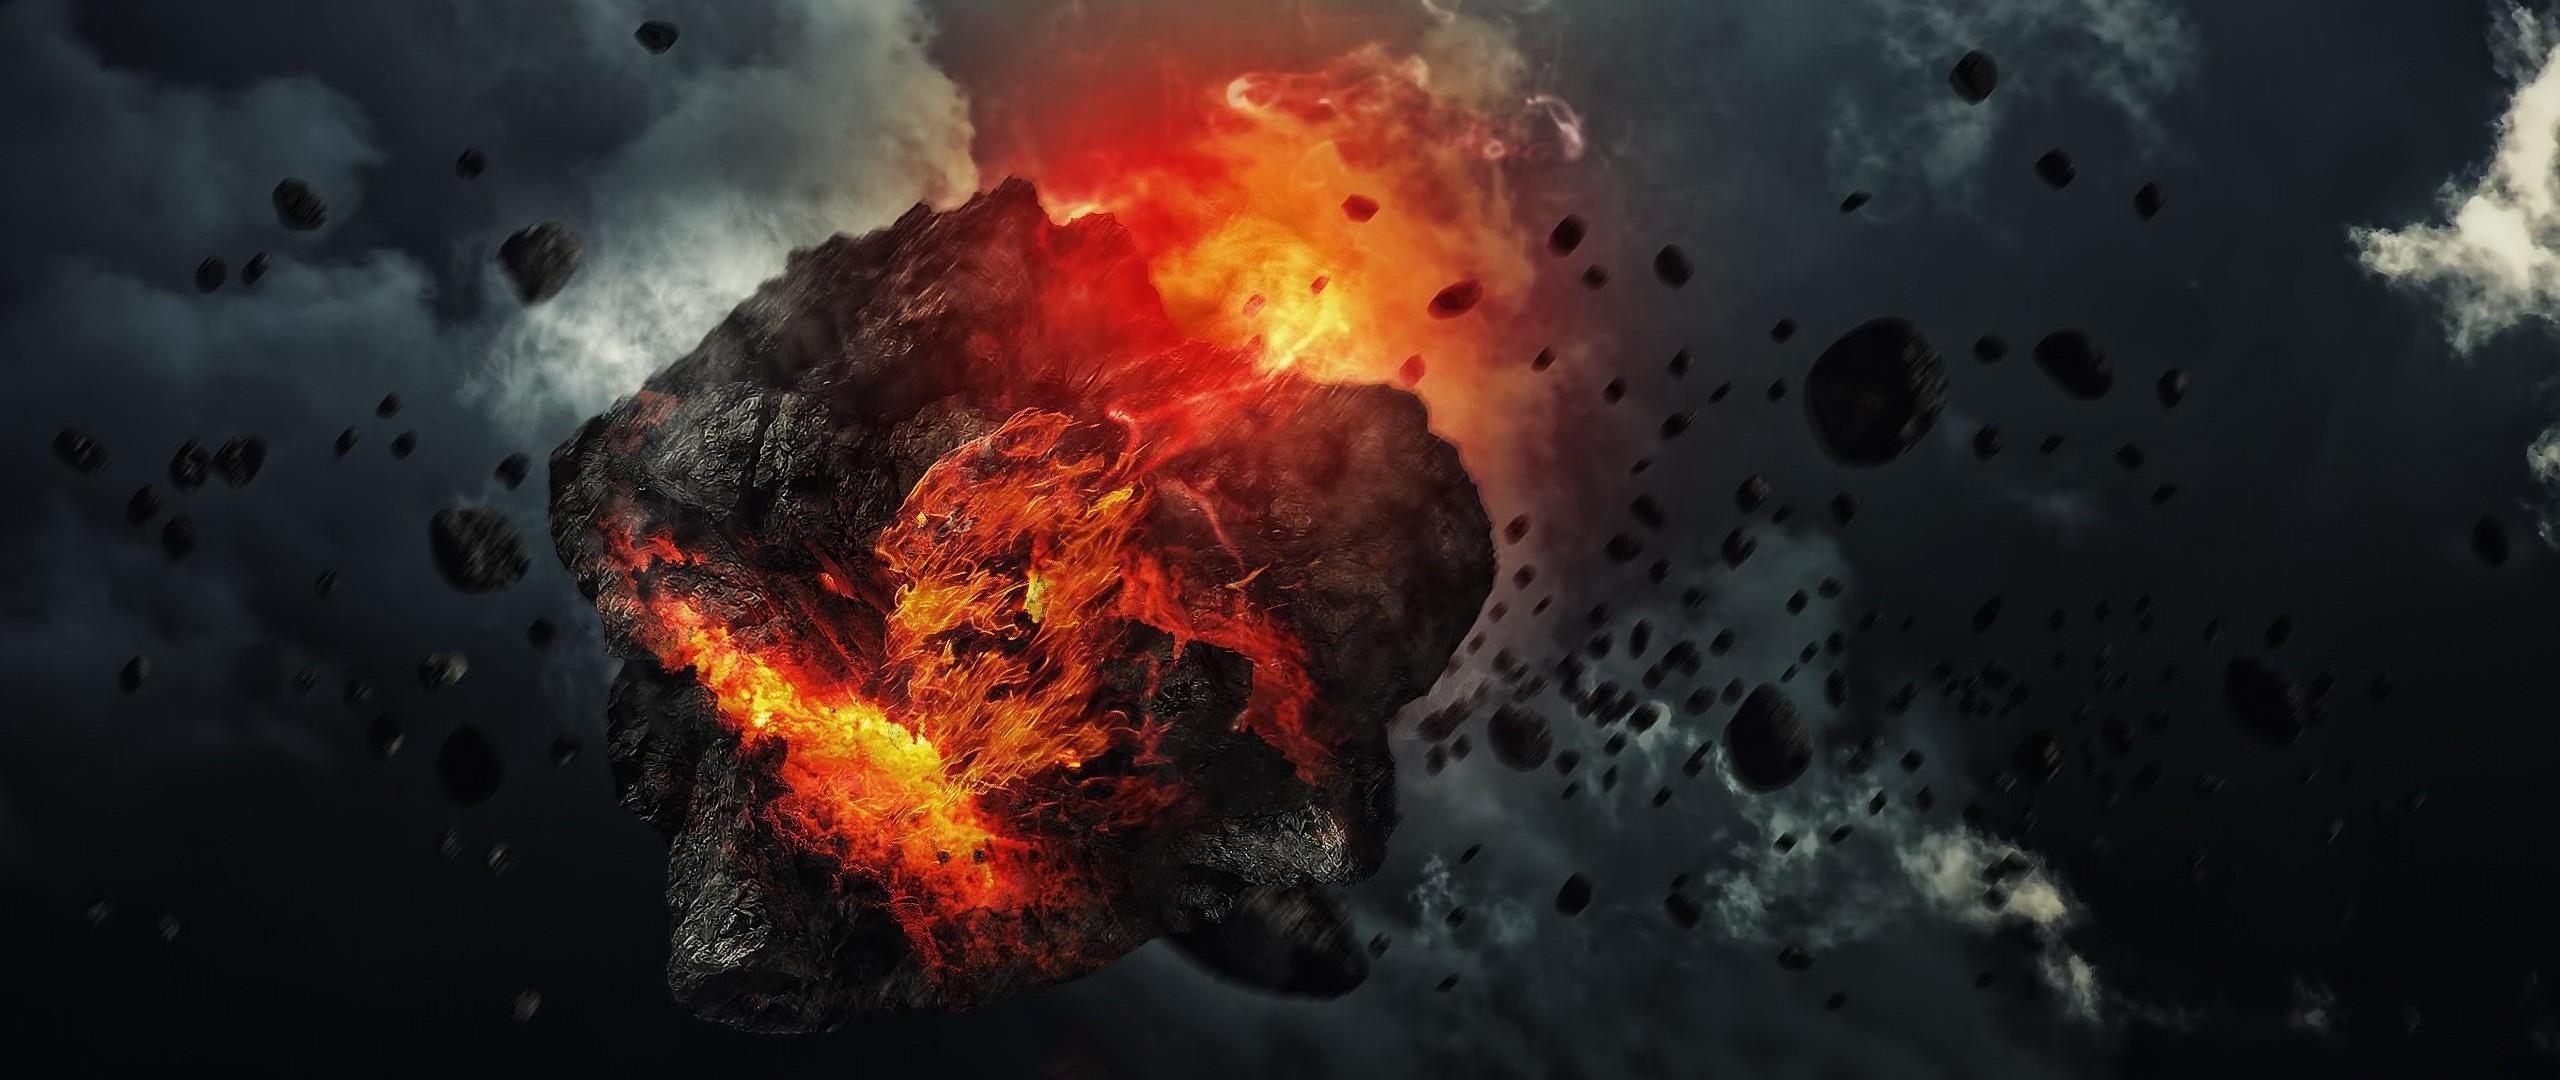 Wallpaper 2560x1080 meteorite speed space debris smoke 2560x1080 2560x1080